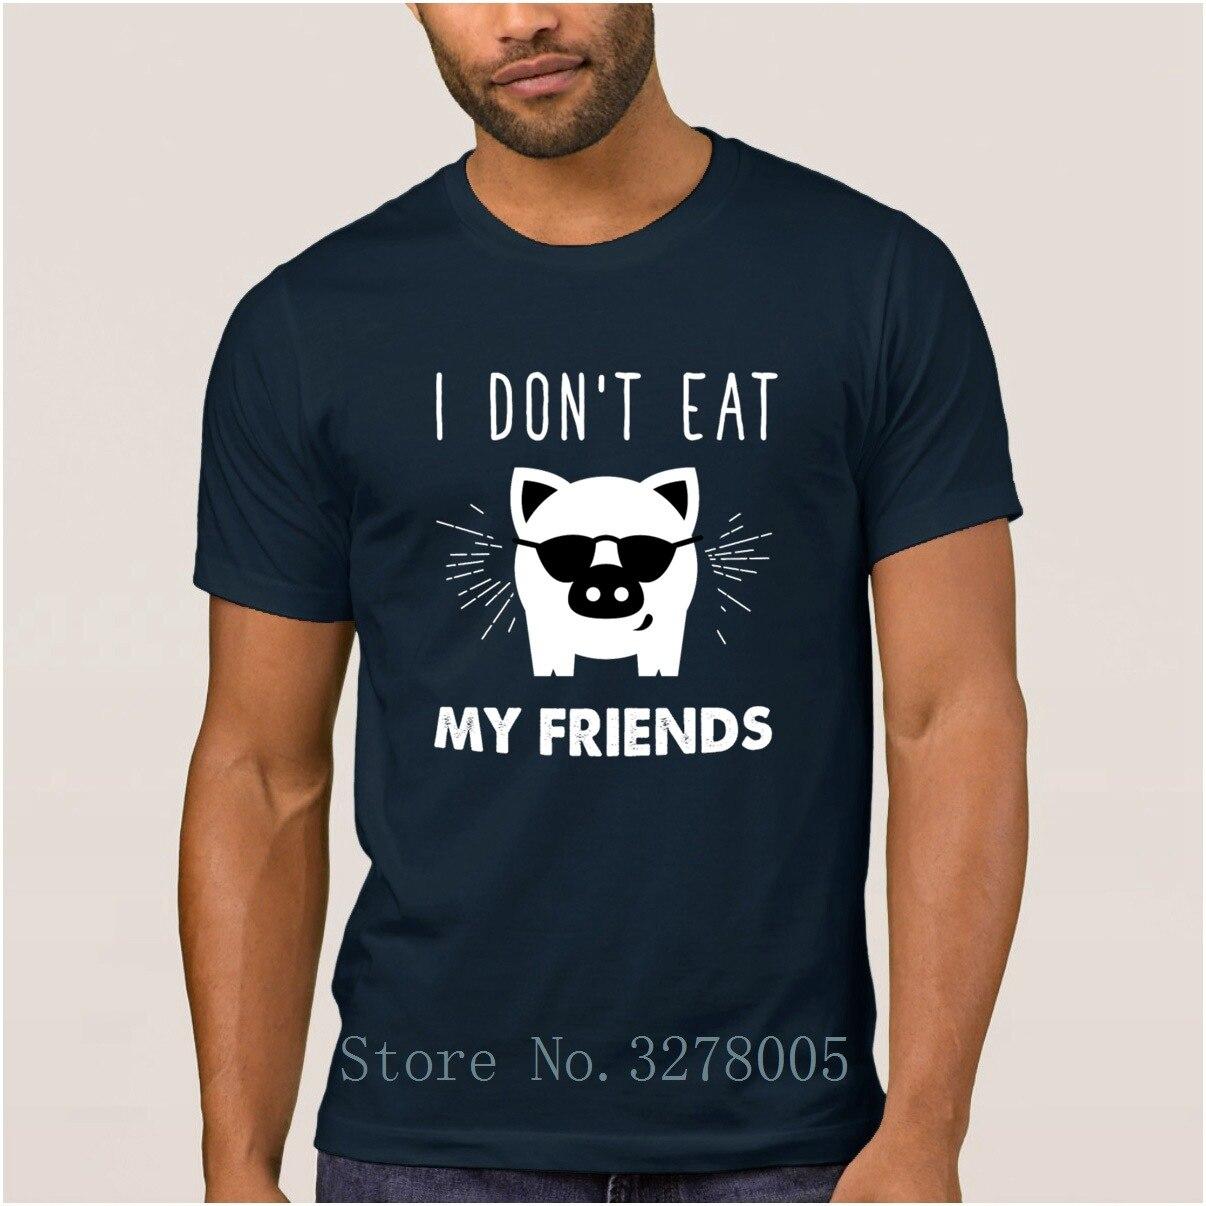 e758d7a9 Brand La Maxpa Build Your Own I Dont Eat My Friends Novelty Men's T Shirts  2018 T-Shirt Clothes Euro Size Tshirt Men